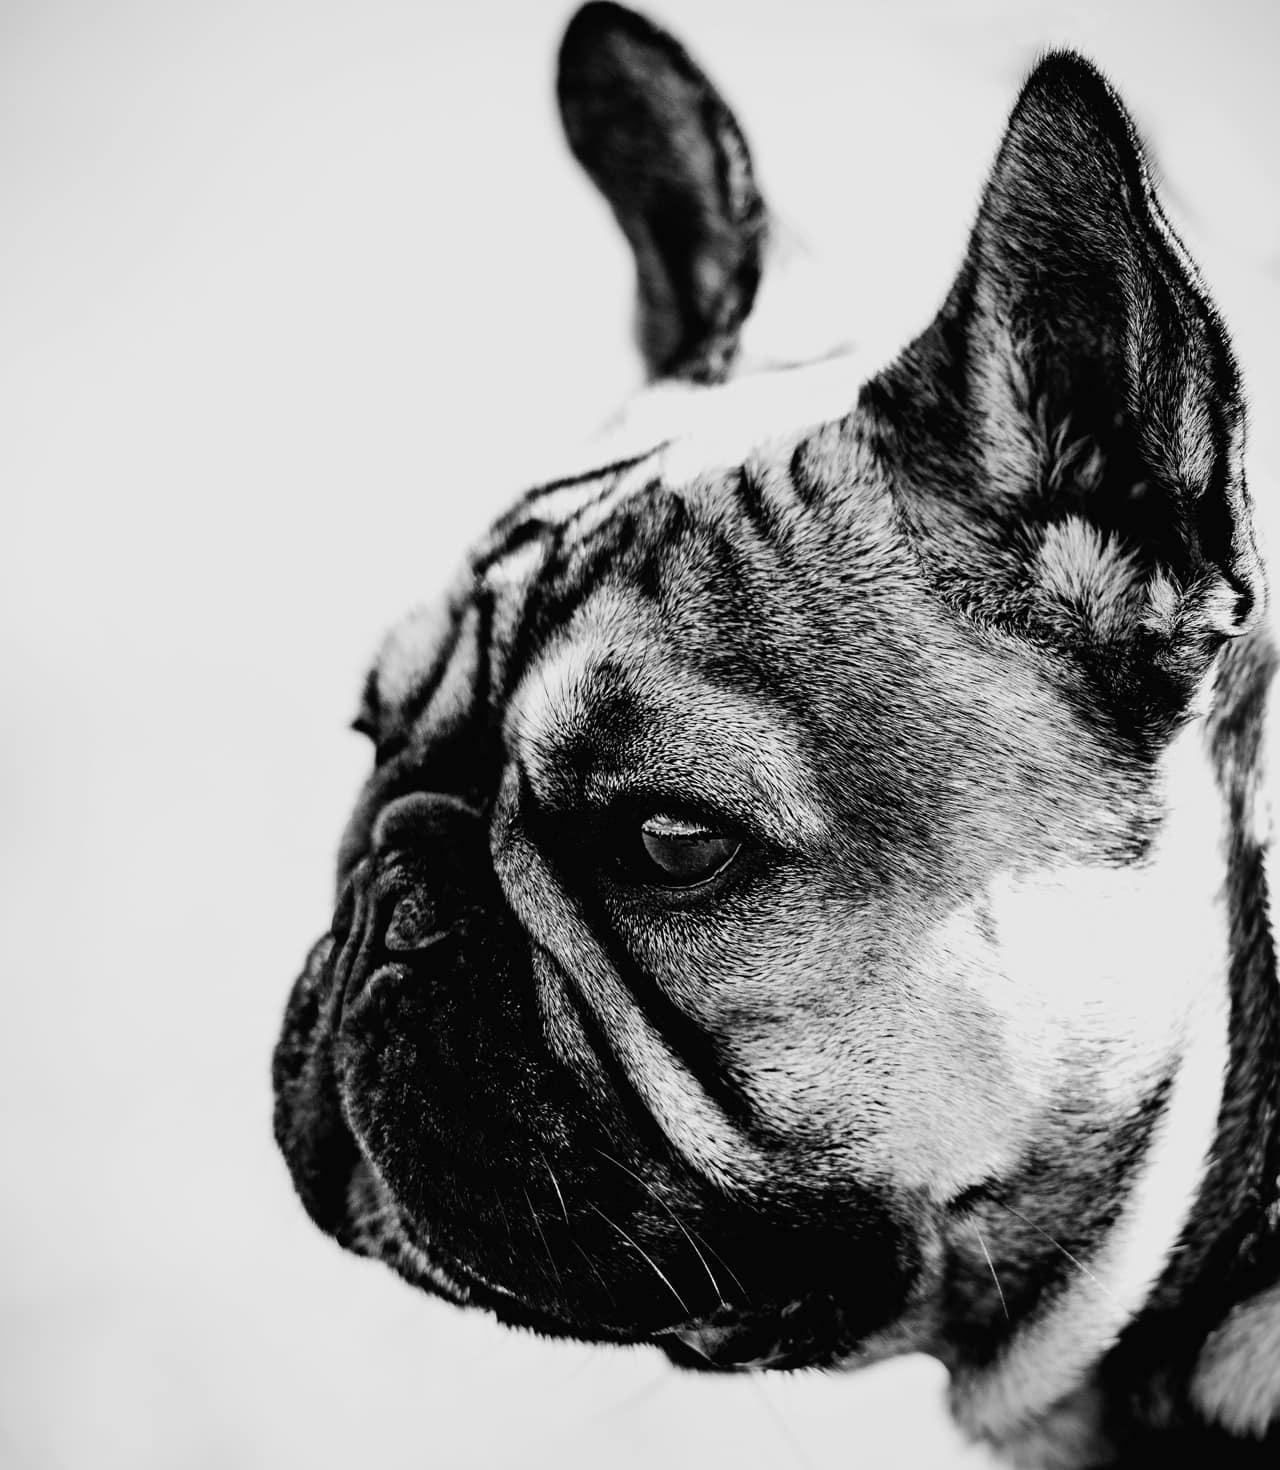 French bulldog black and white photograph